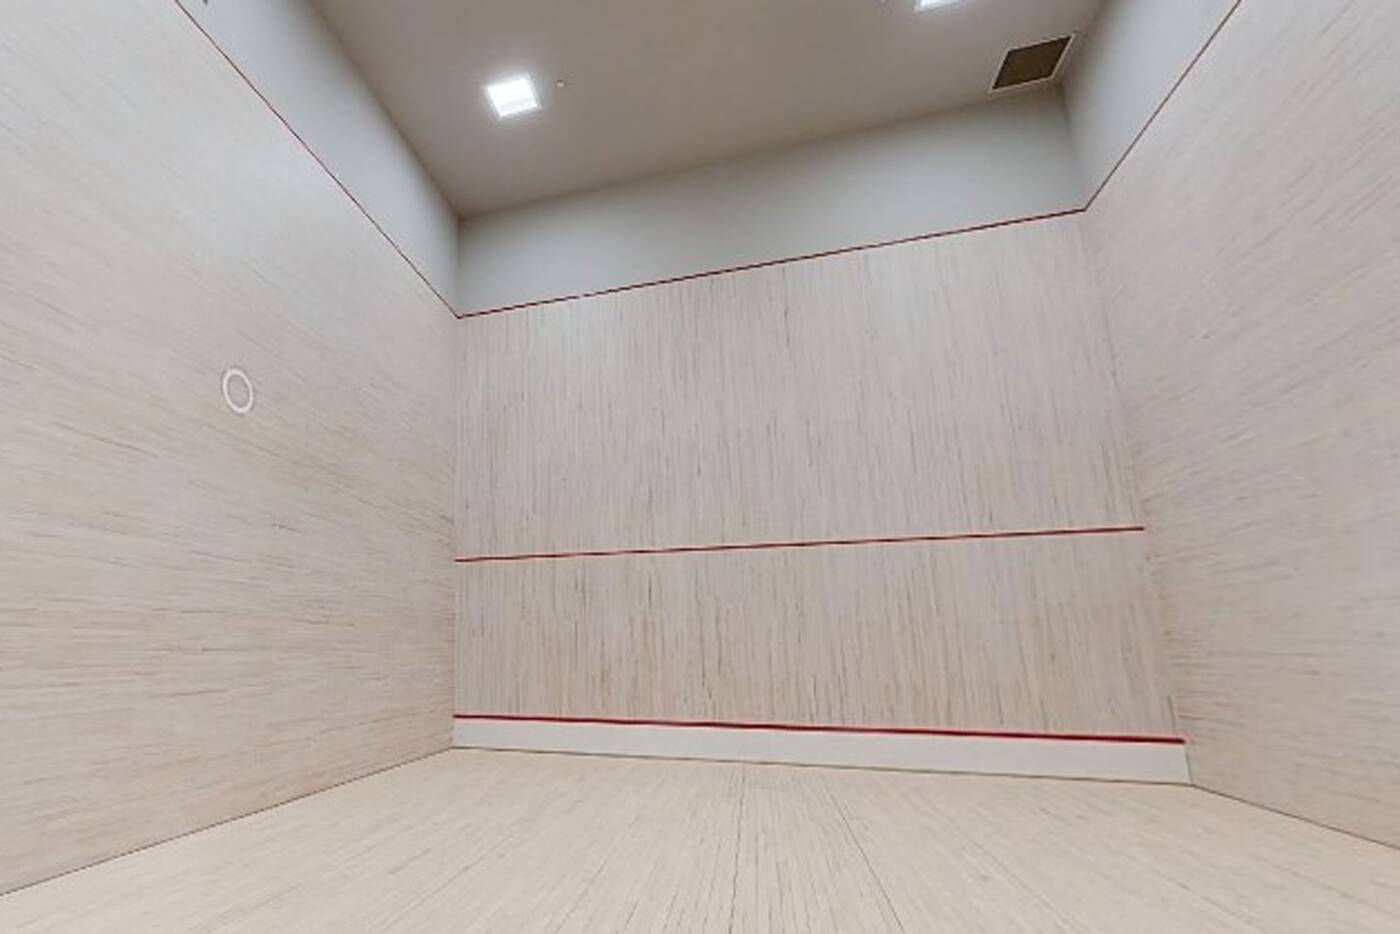 badminton raquet club toronto